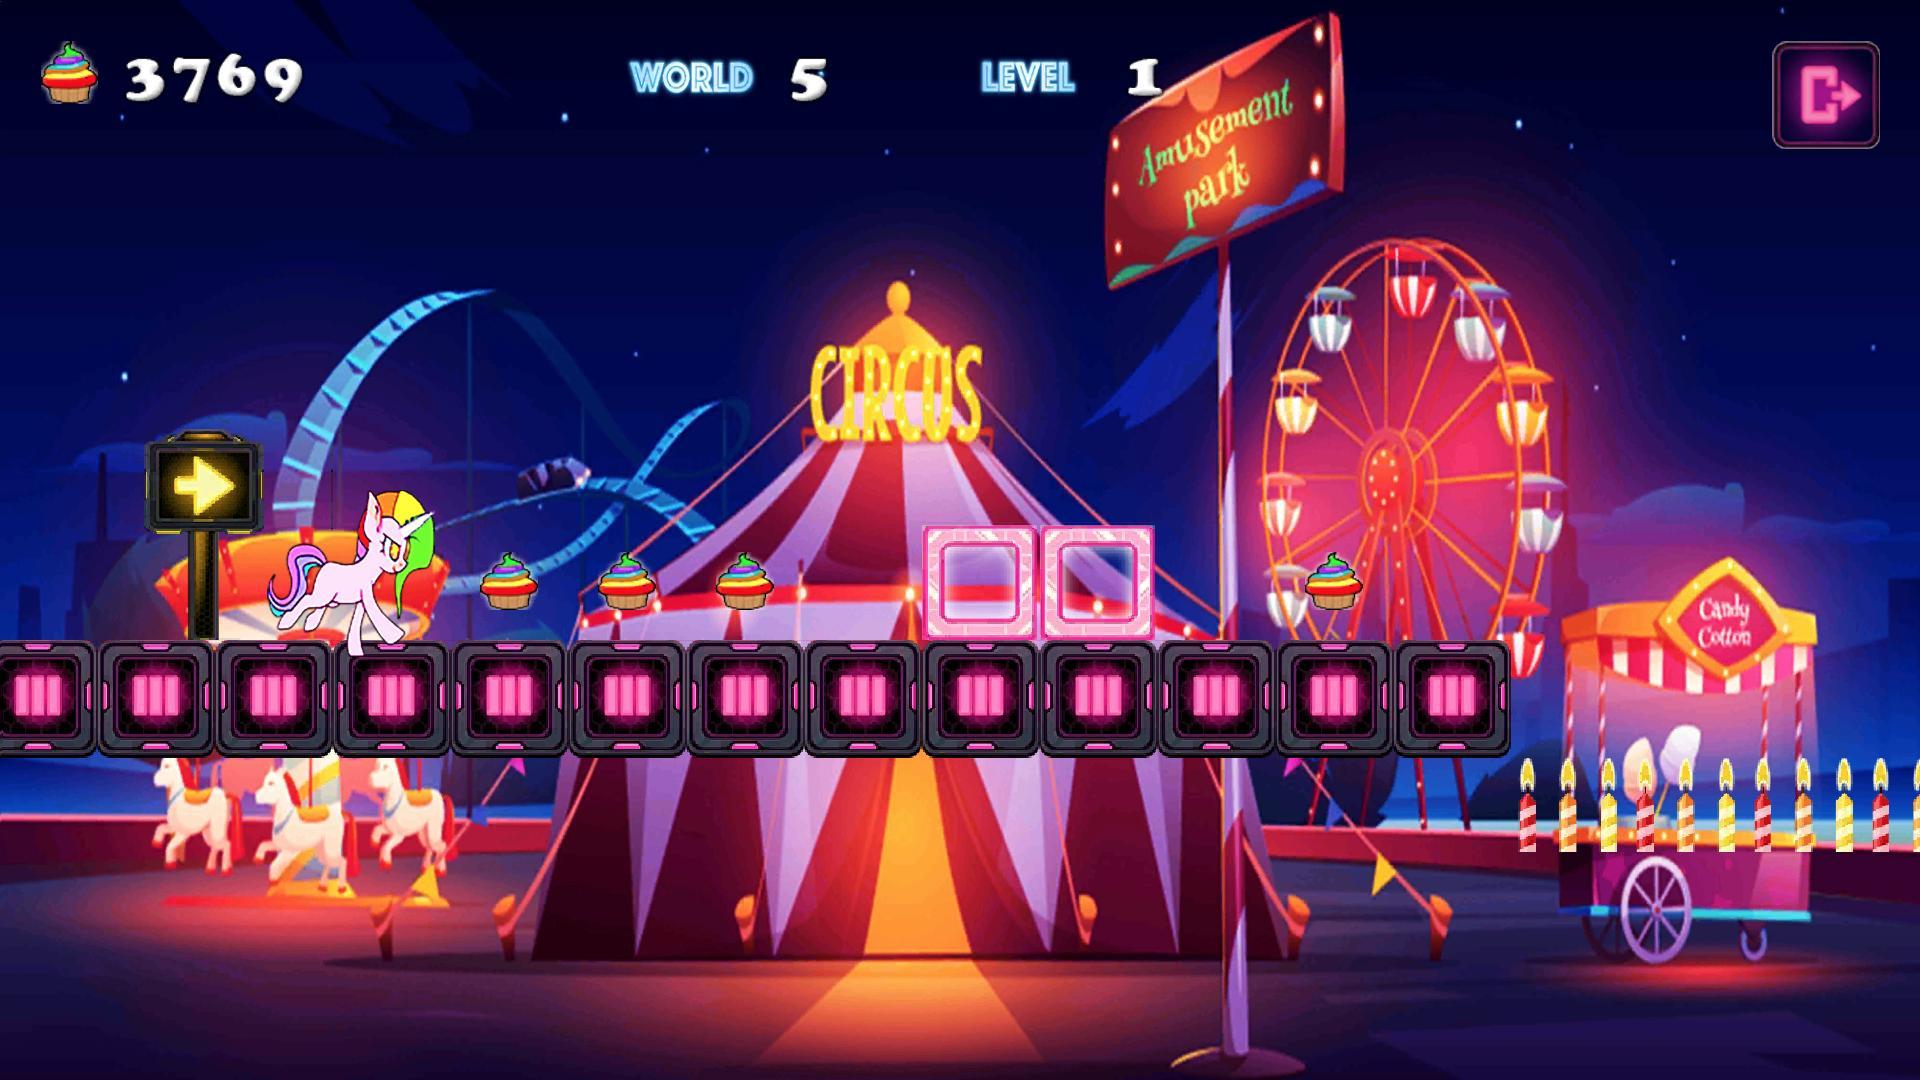 Unicorn Dash Neon Lights Unicorn Games mlp games 2.8.105 Screenshot 5